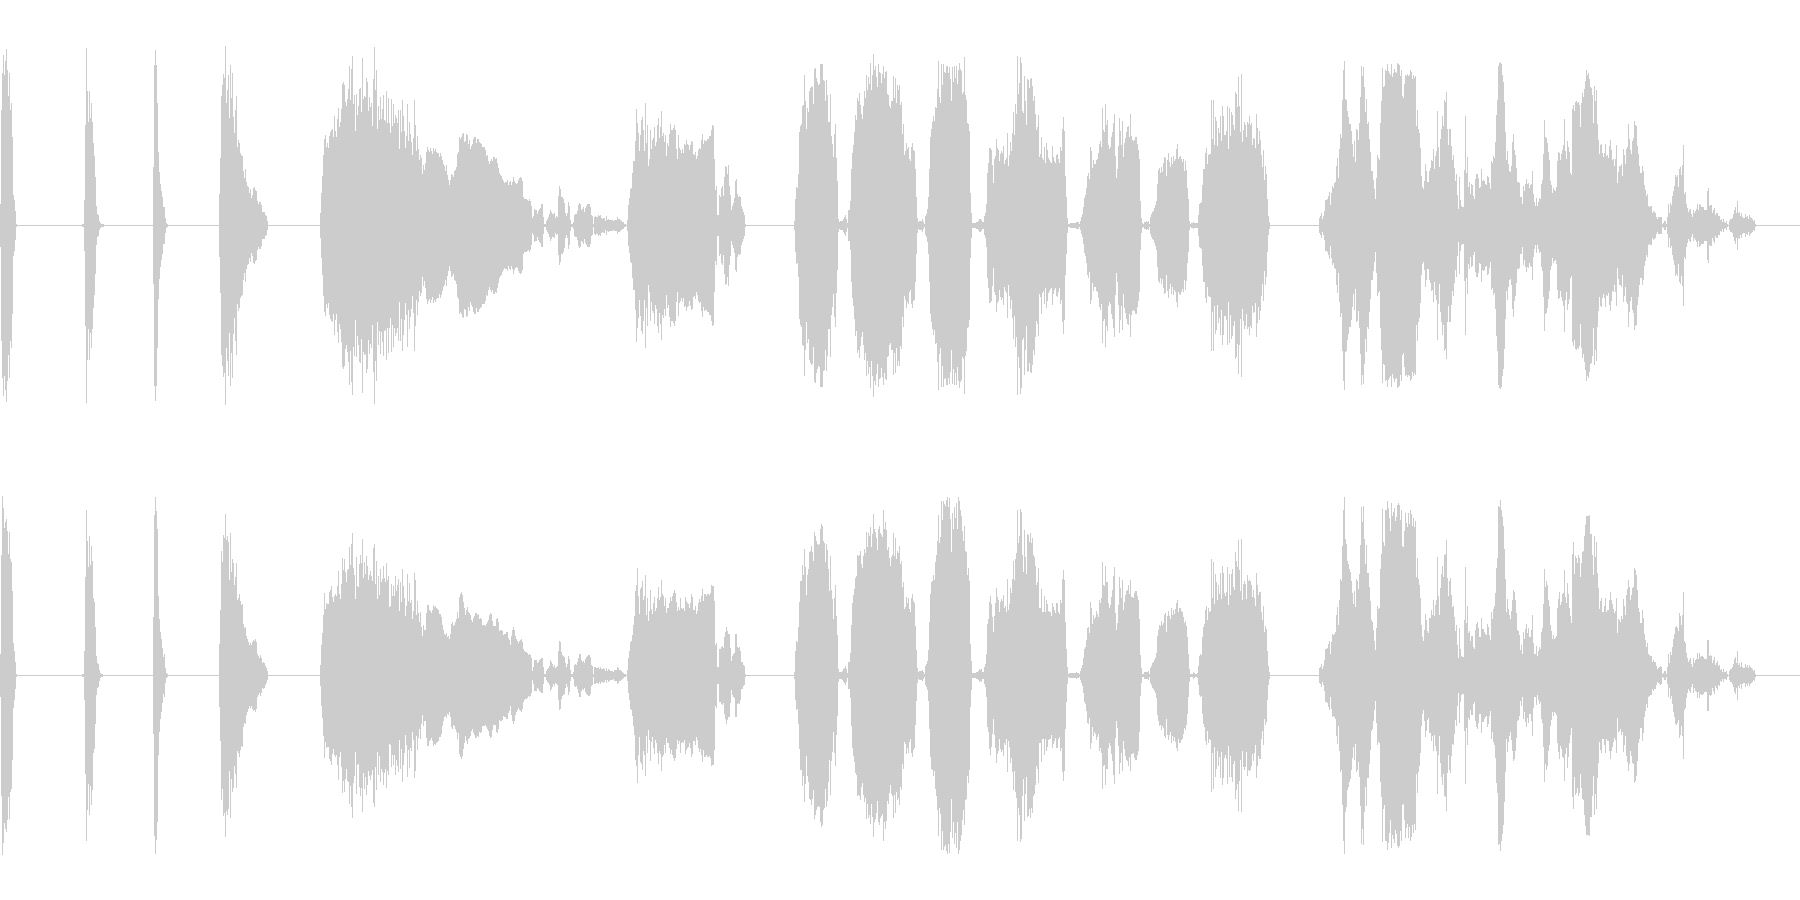 SCREAMS、GROANS、SC...の未再生の波形